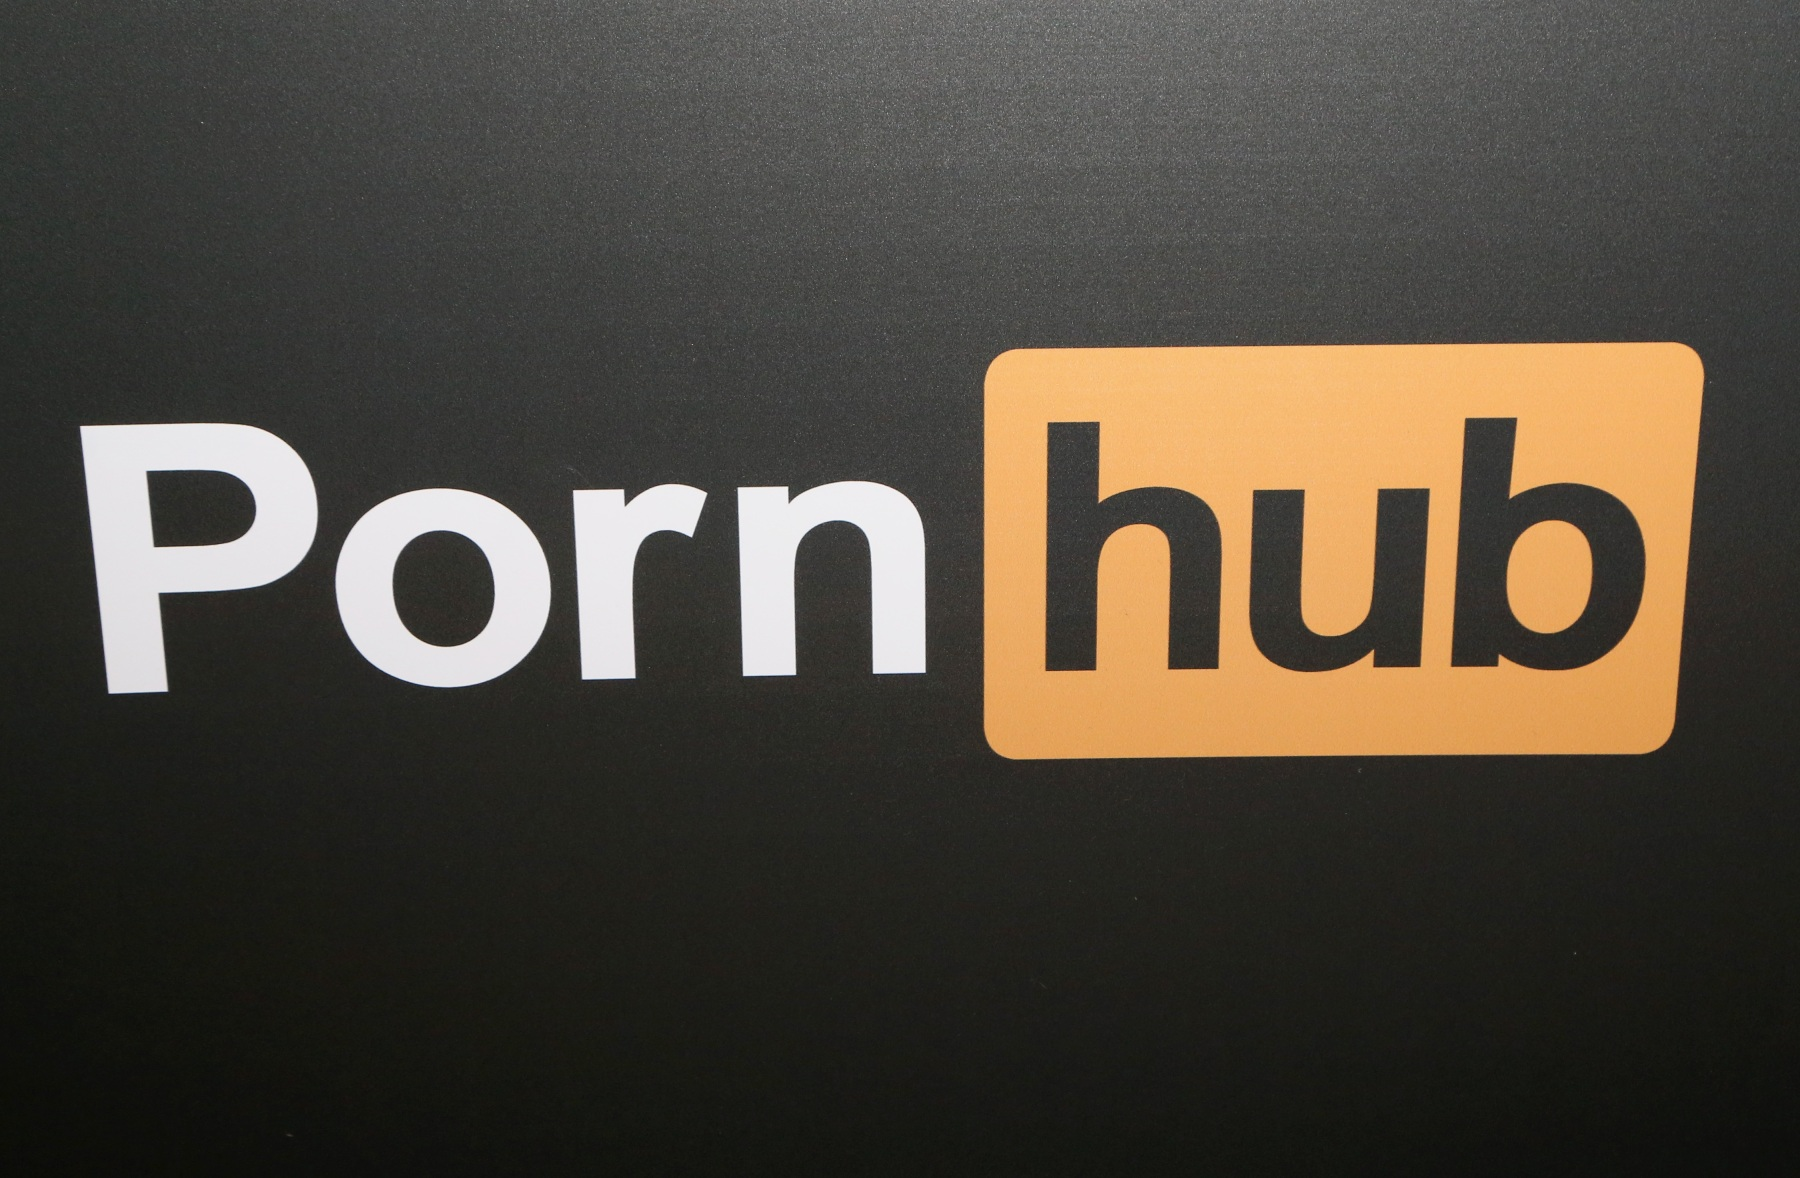 UK Porn Age Block